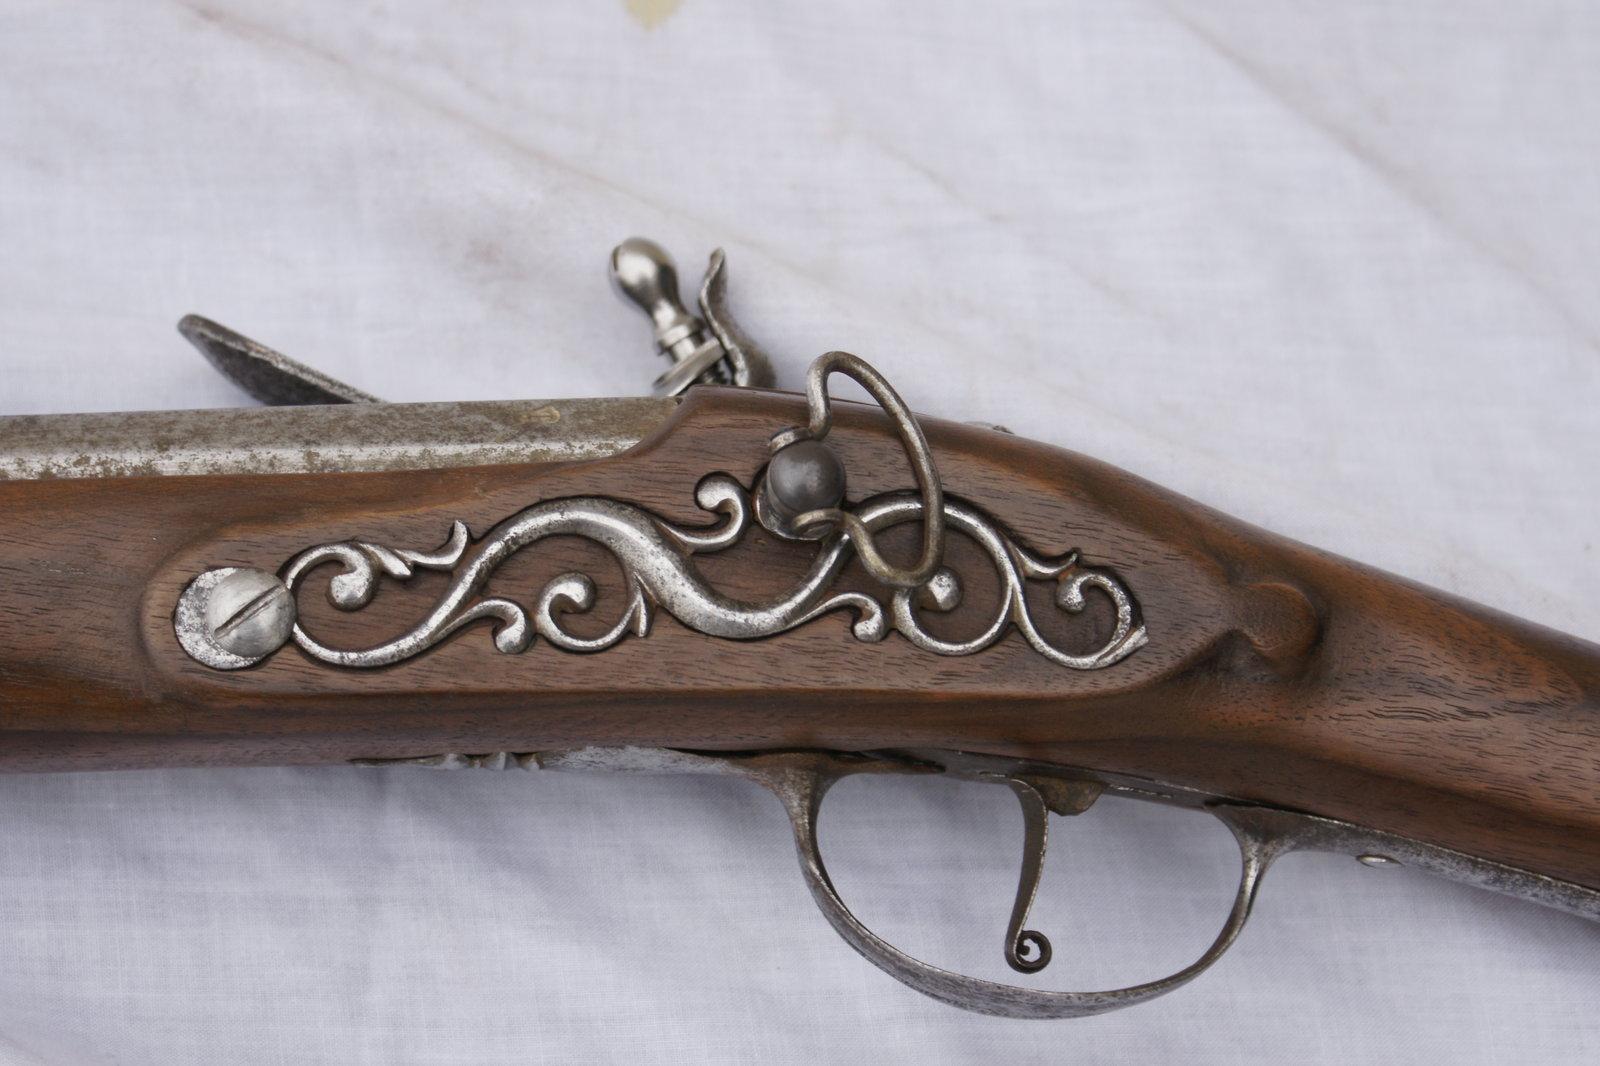 un fusil de marine pre-reglementaire 200228035216466821